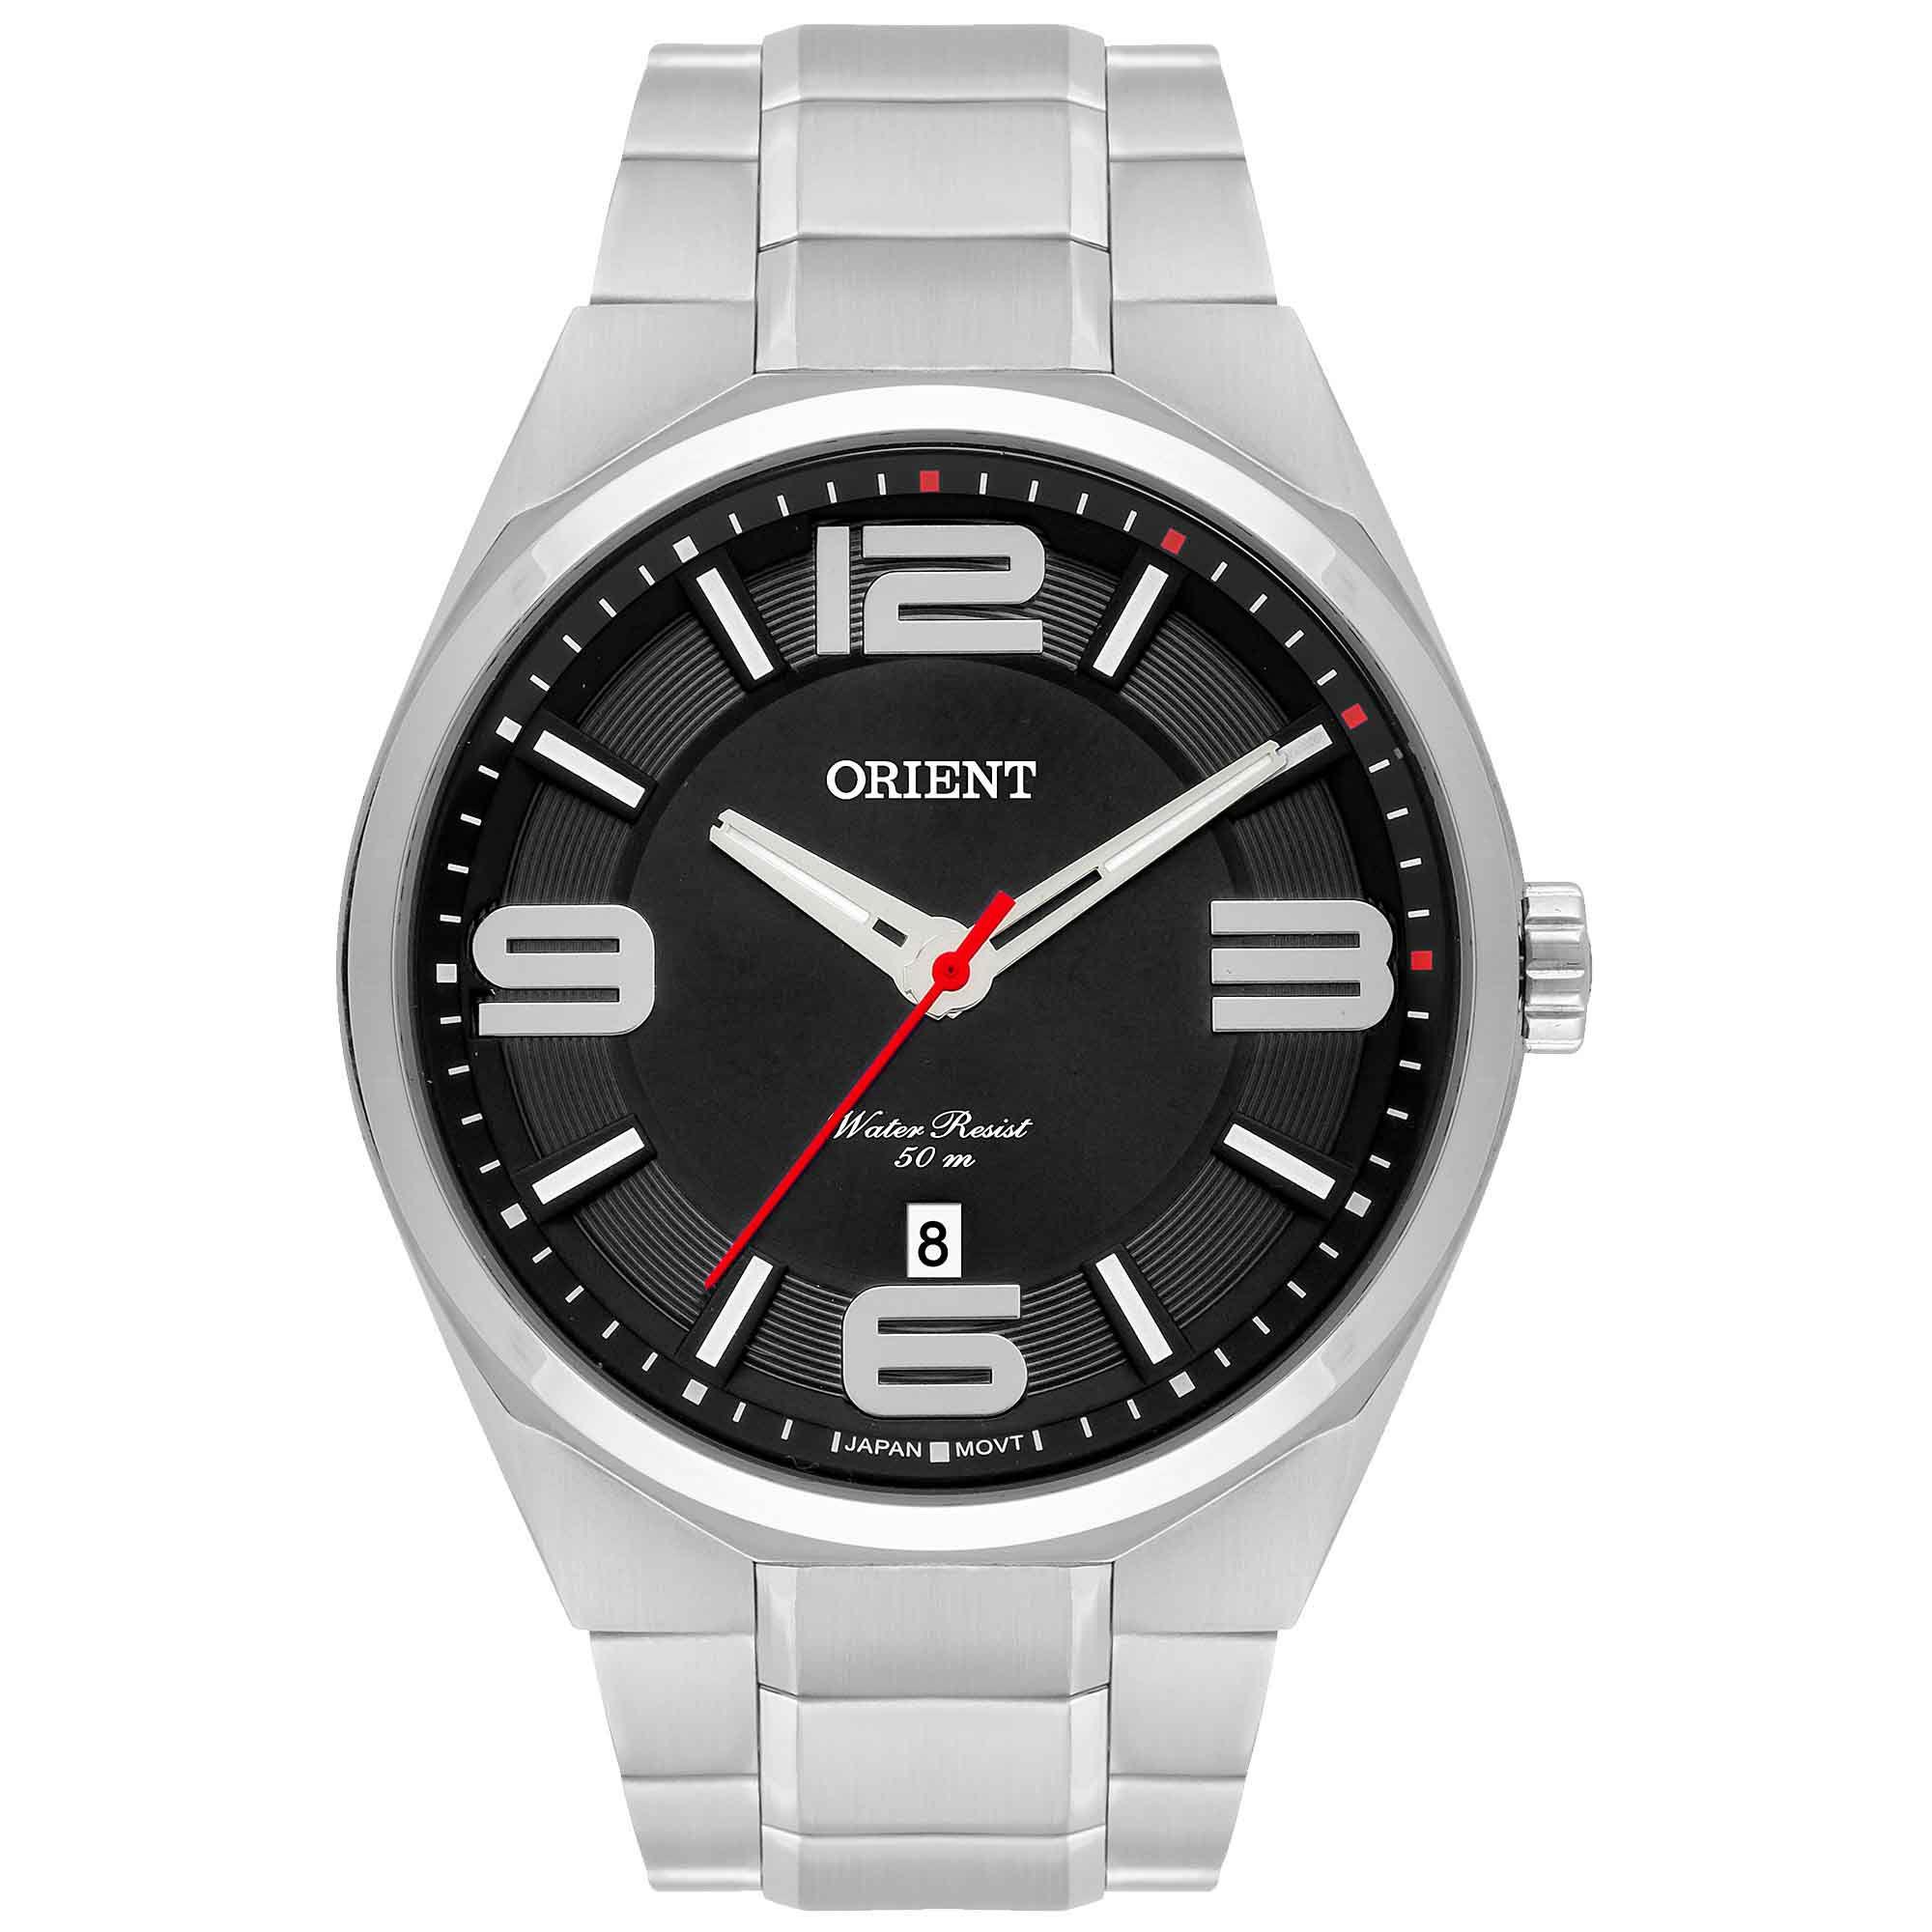 Relógio Masculino Orient MBSS1326 P2SX